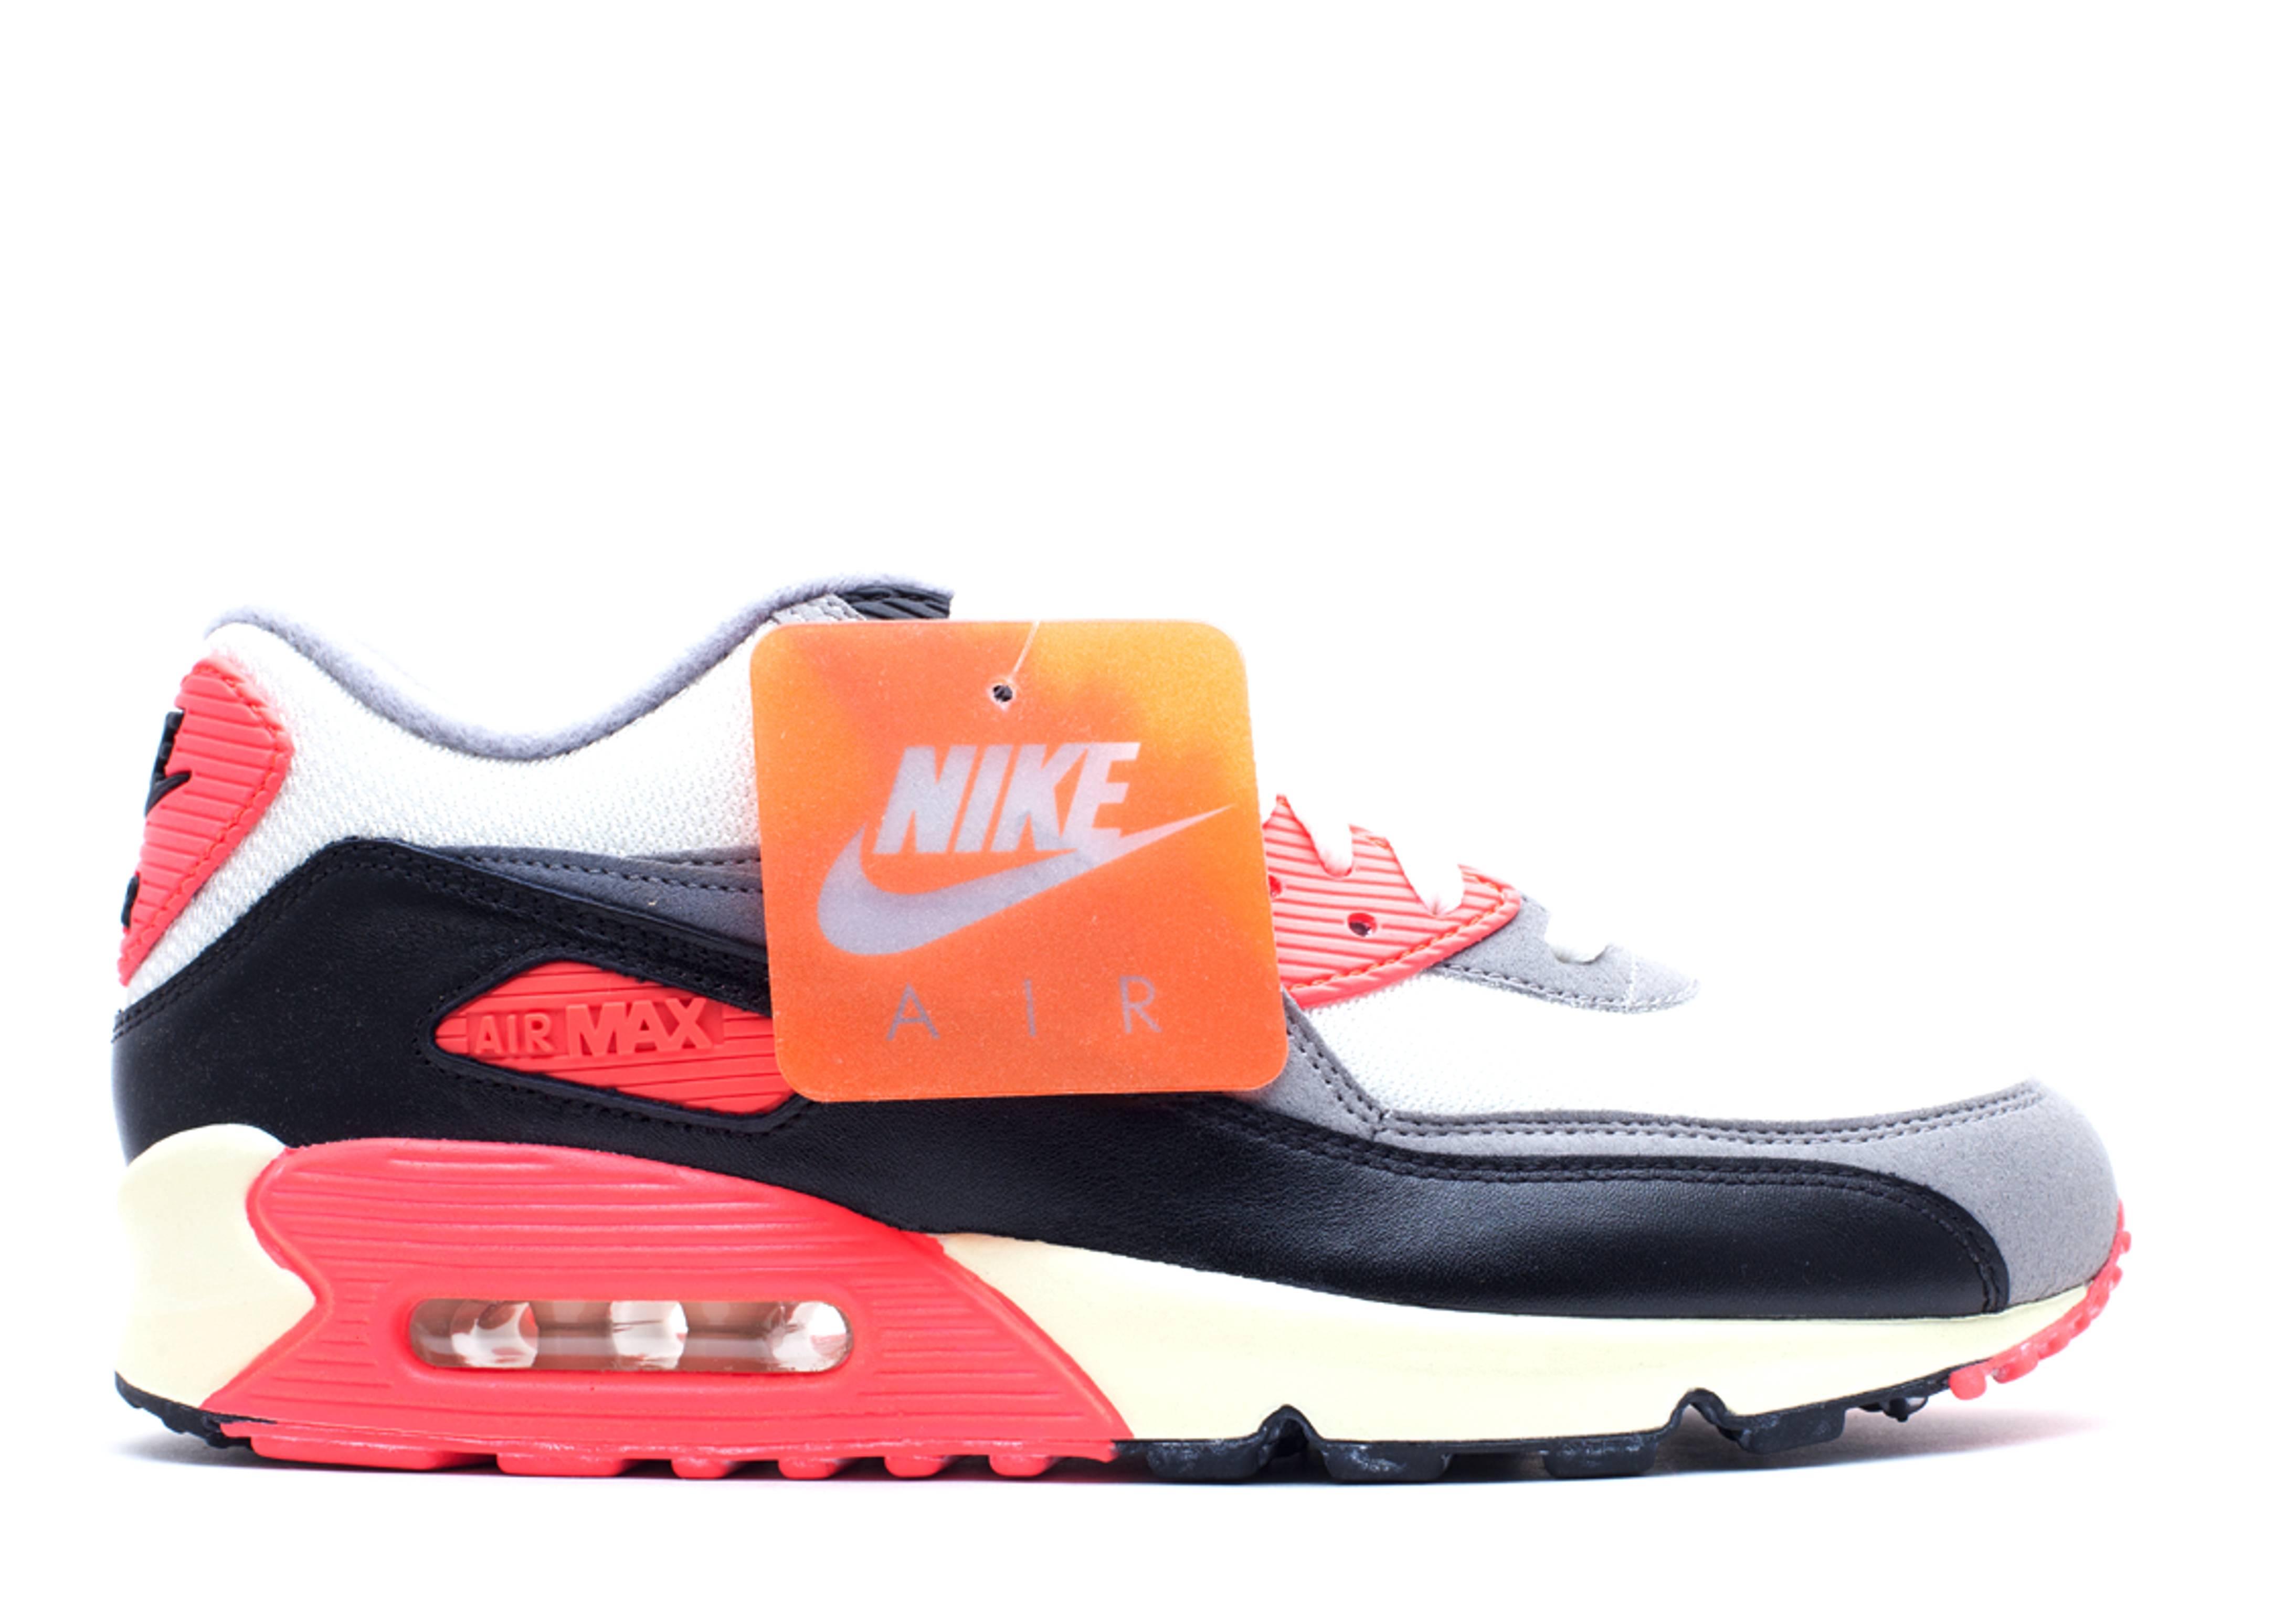 new styles 3ad1a 796f3 air max 90 fantastic